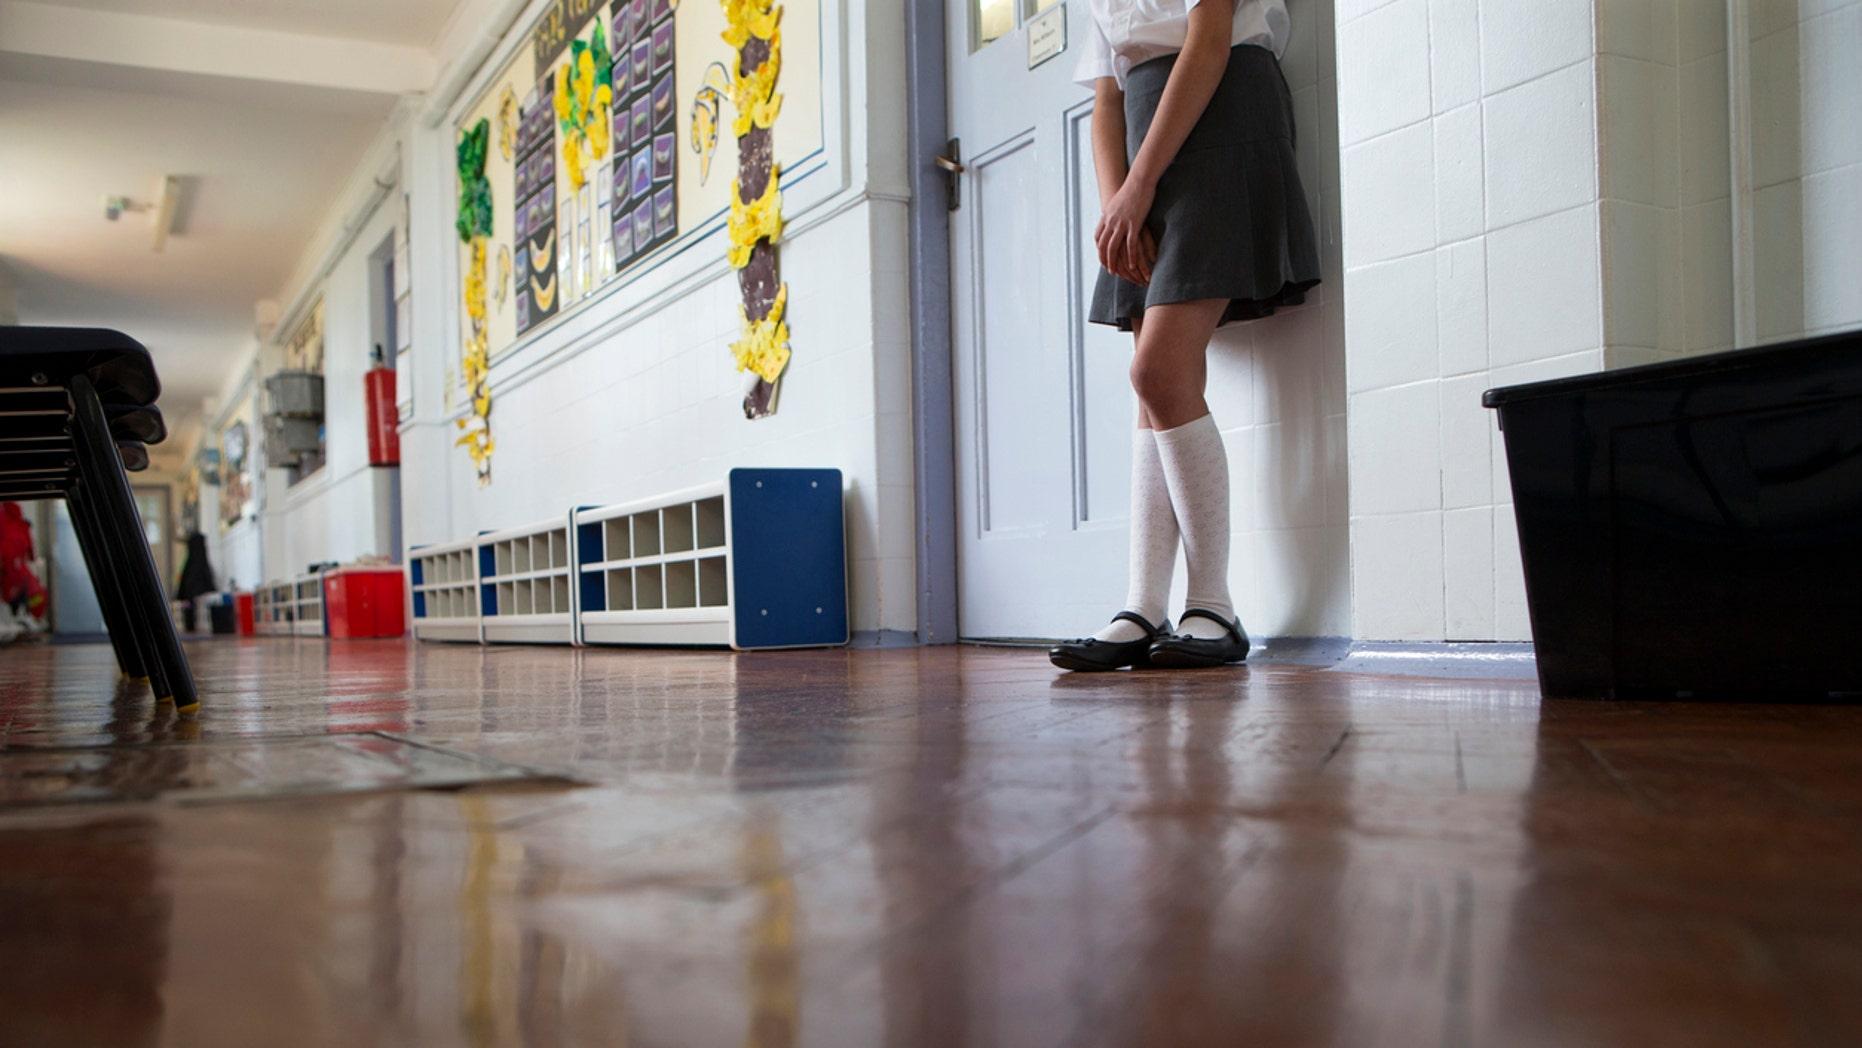 Christian parents sue over school's lax dress code.